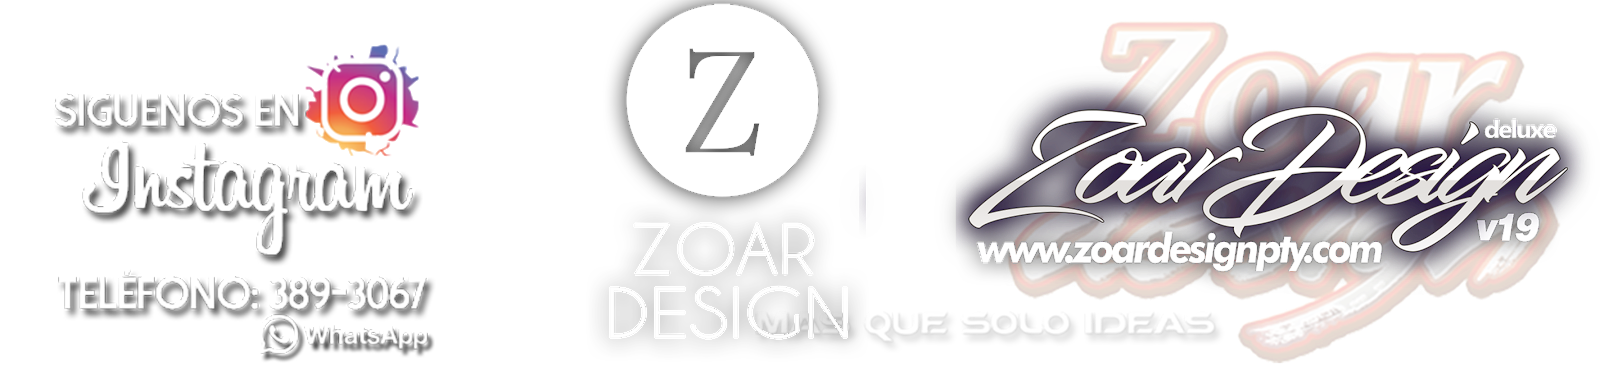 Zoardesignpty.com I Zoar Design I Bordadoszoar l ZoarPanamá